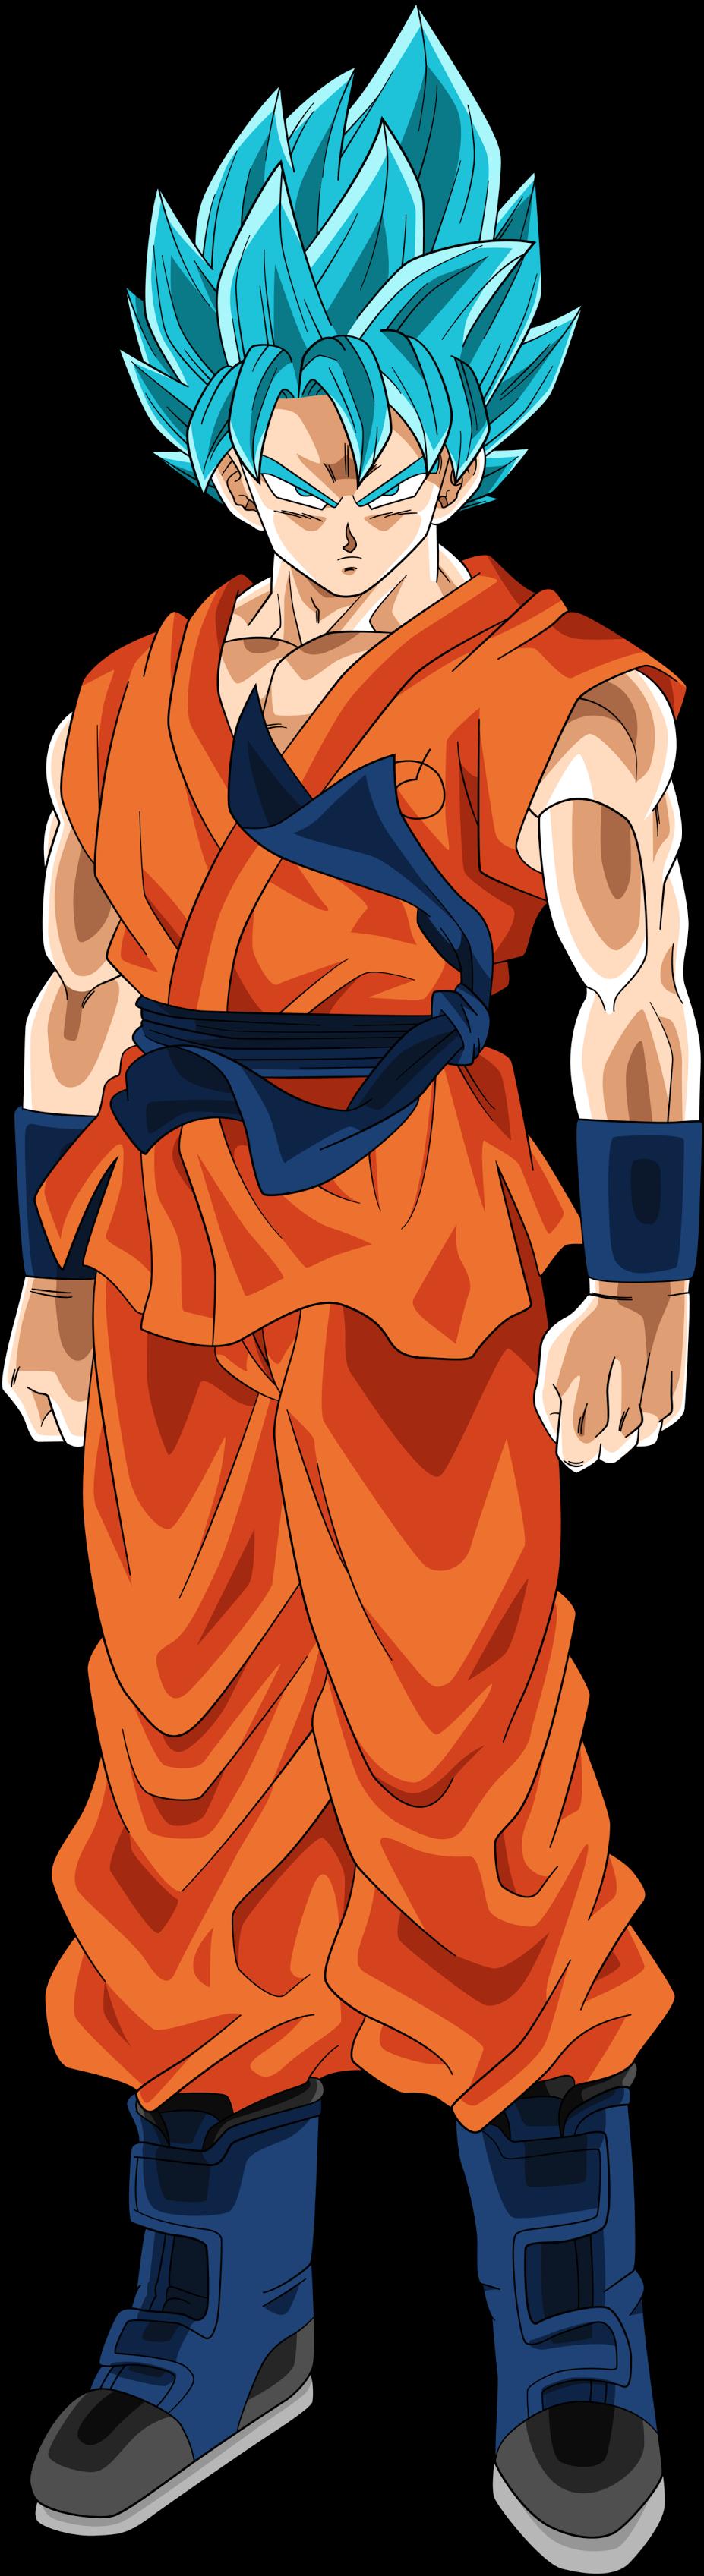 Render Kakaroto + Goku + Dragon ball